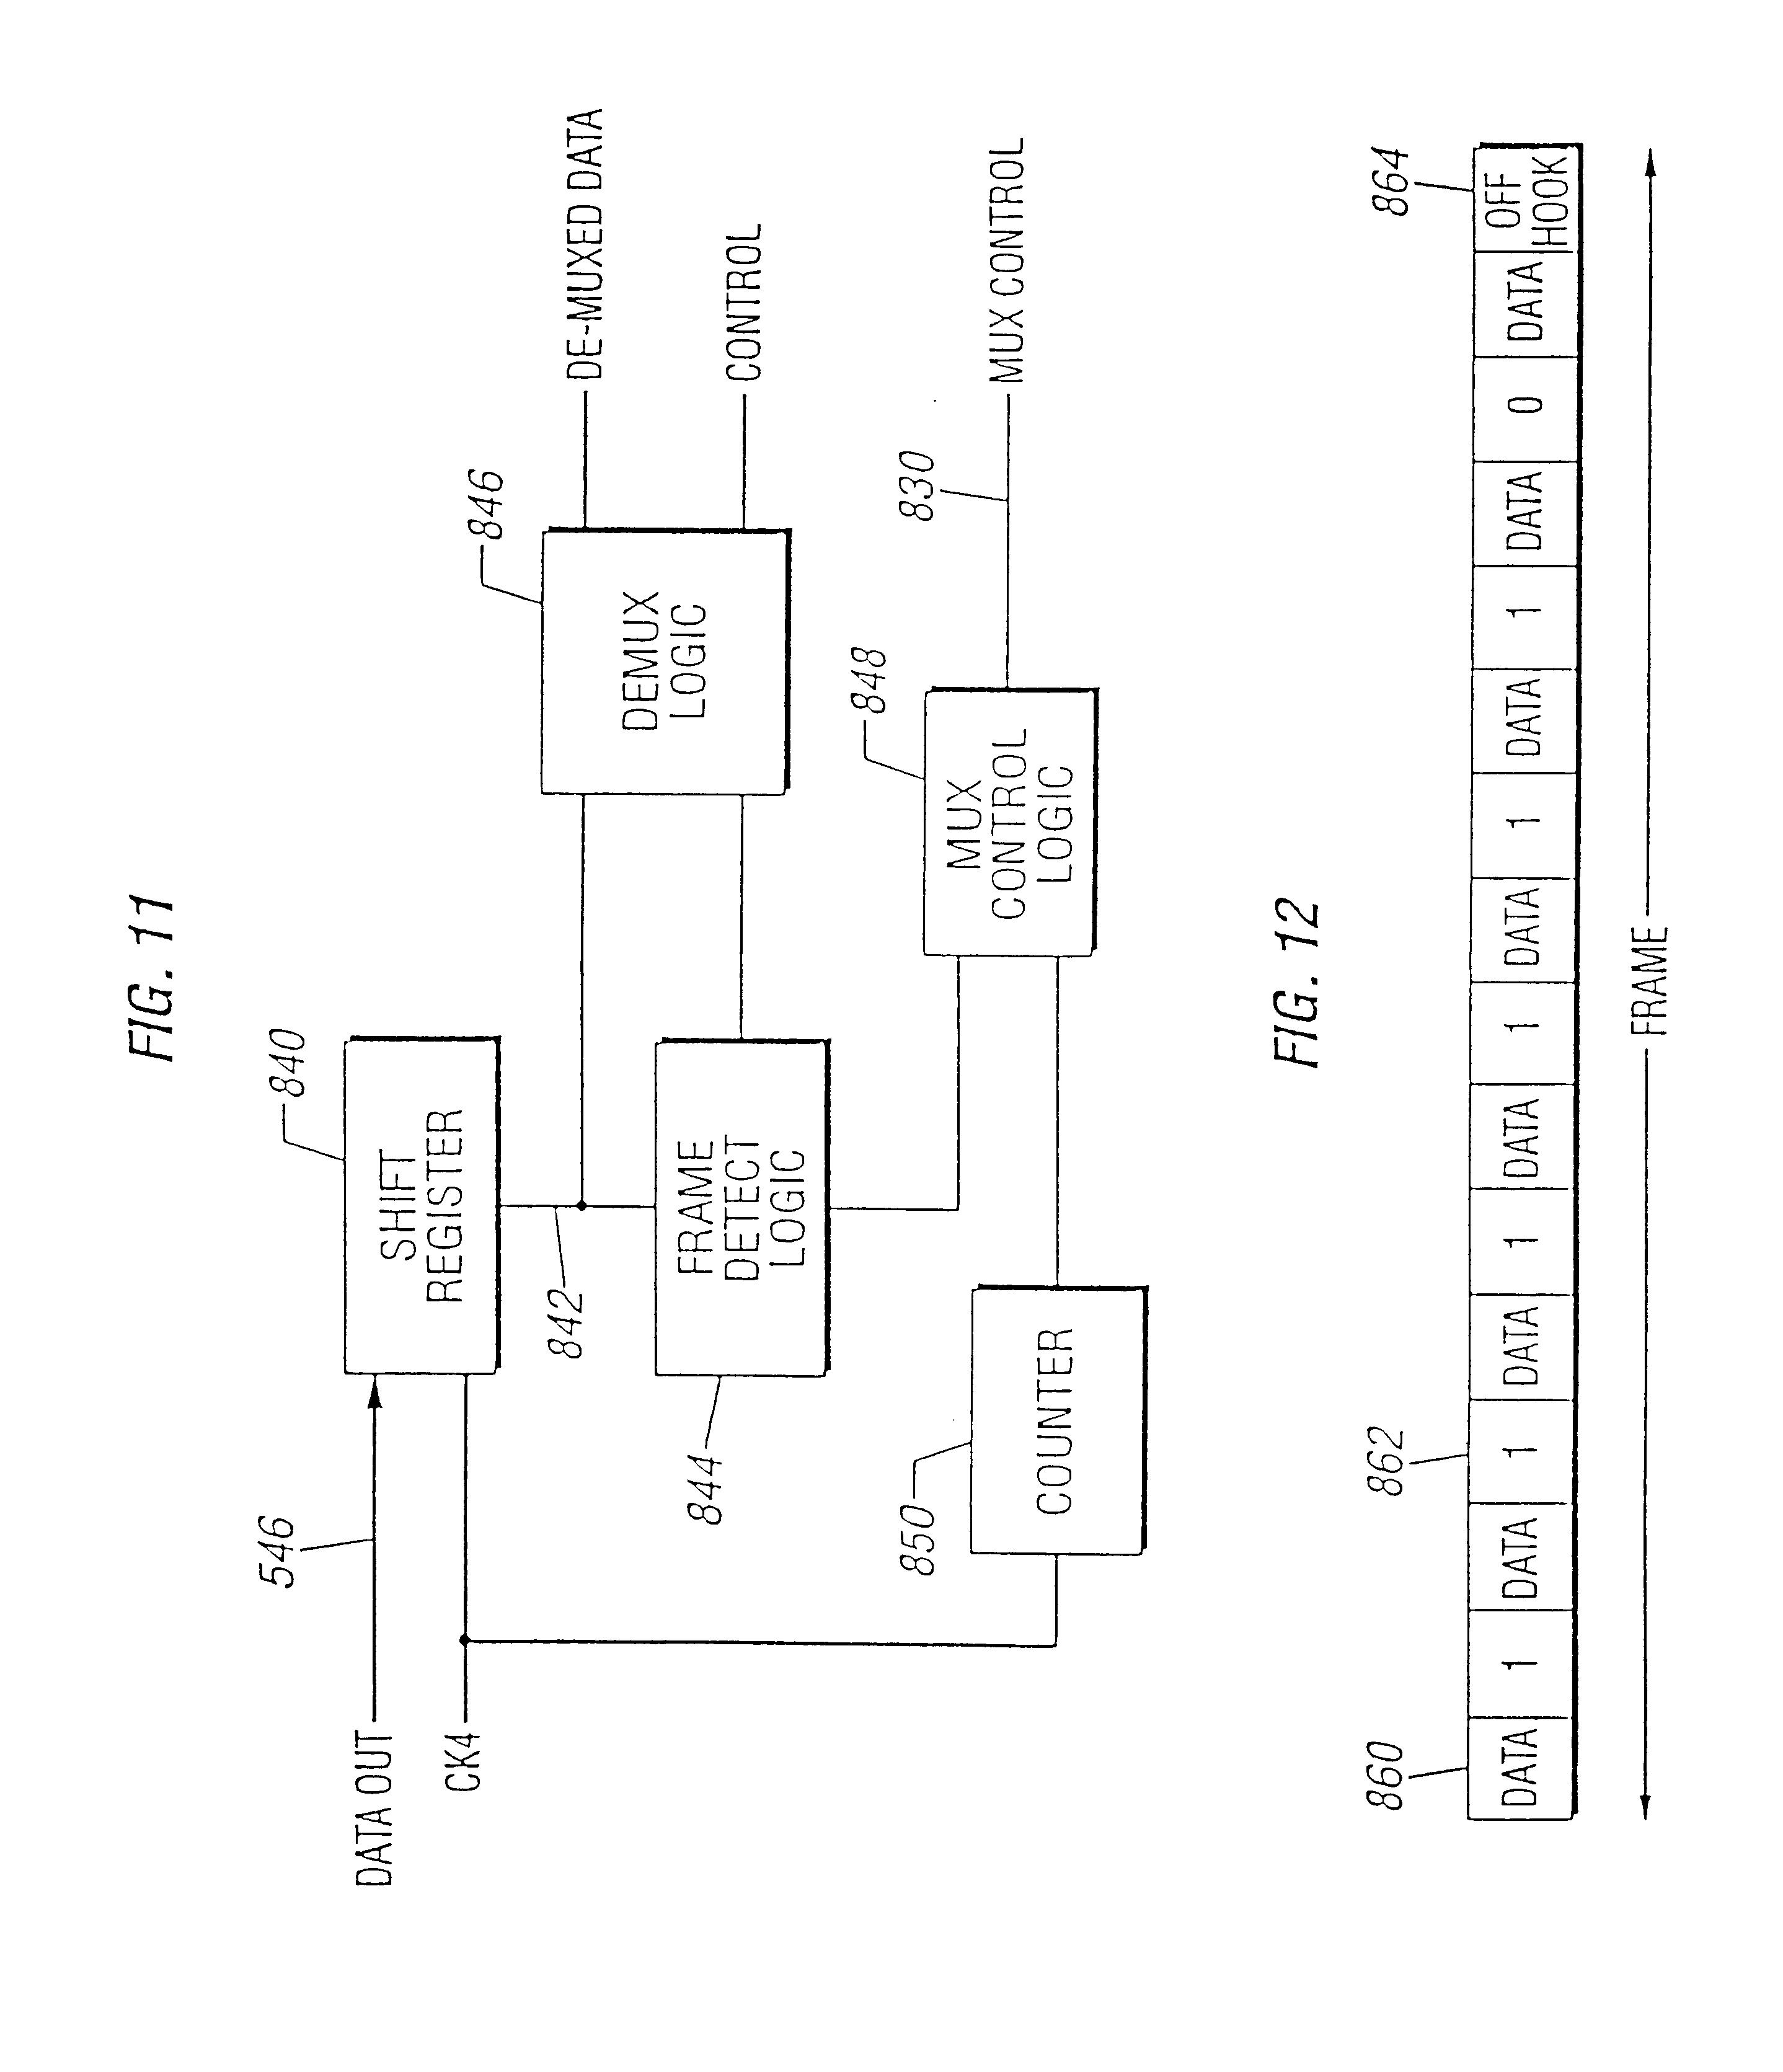 patente us6683548